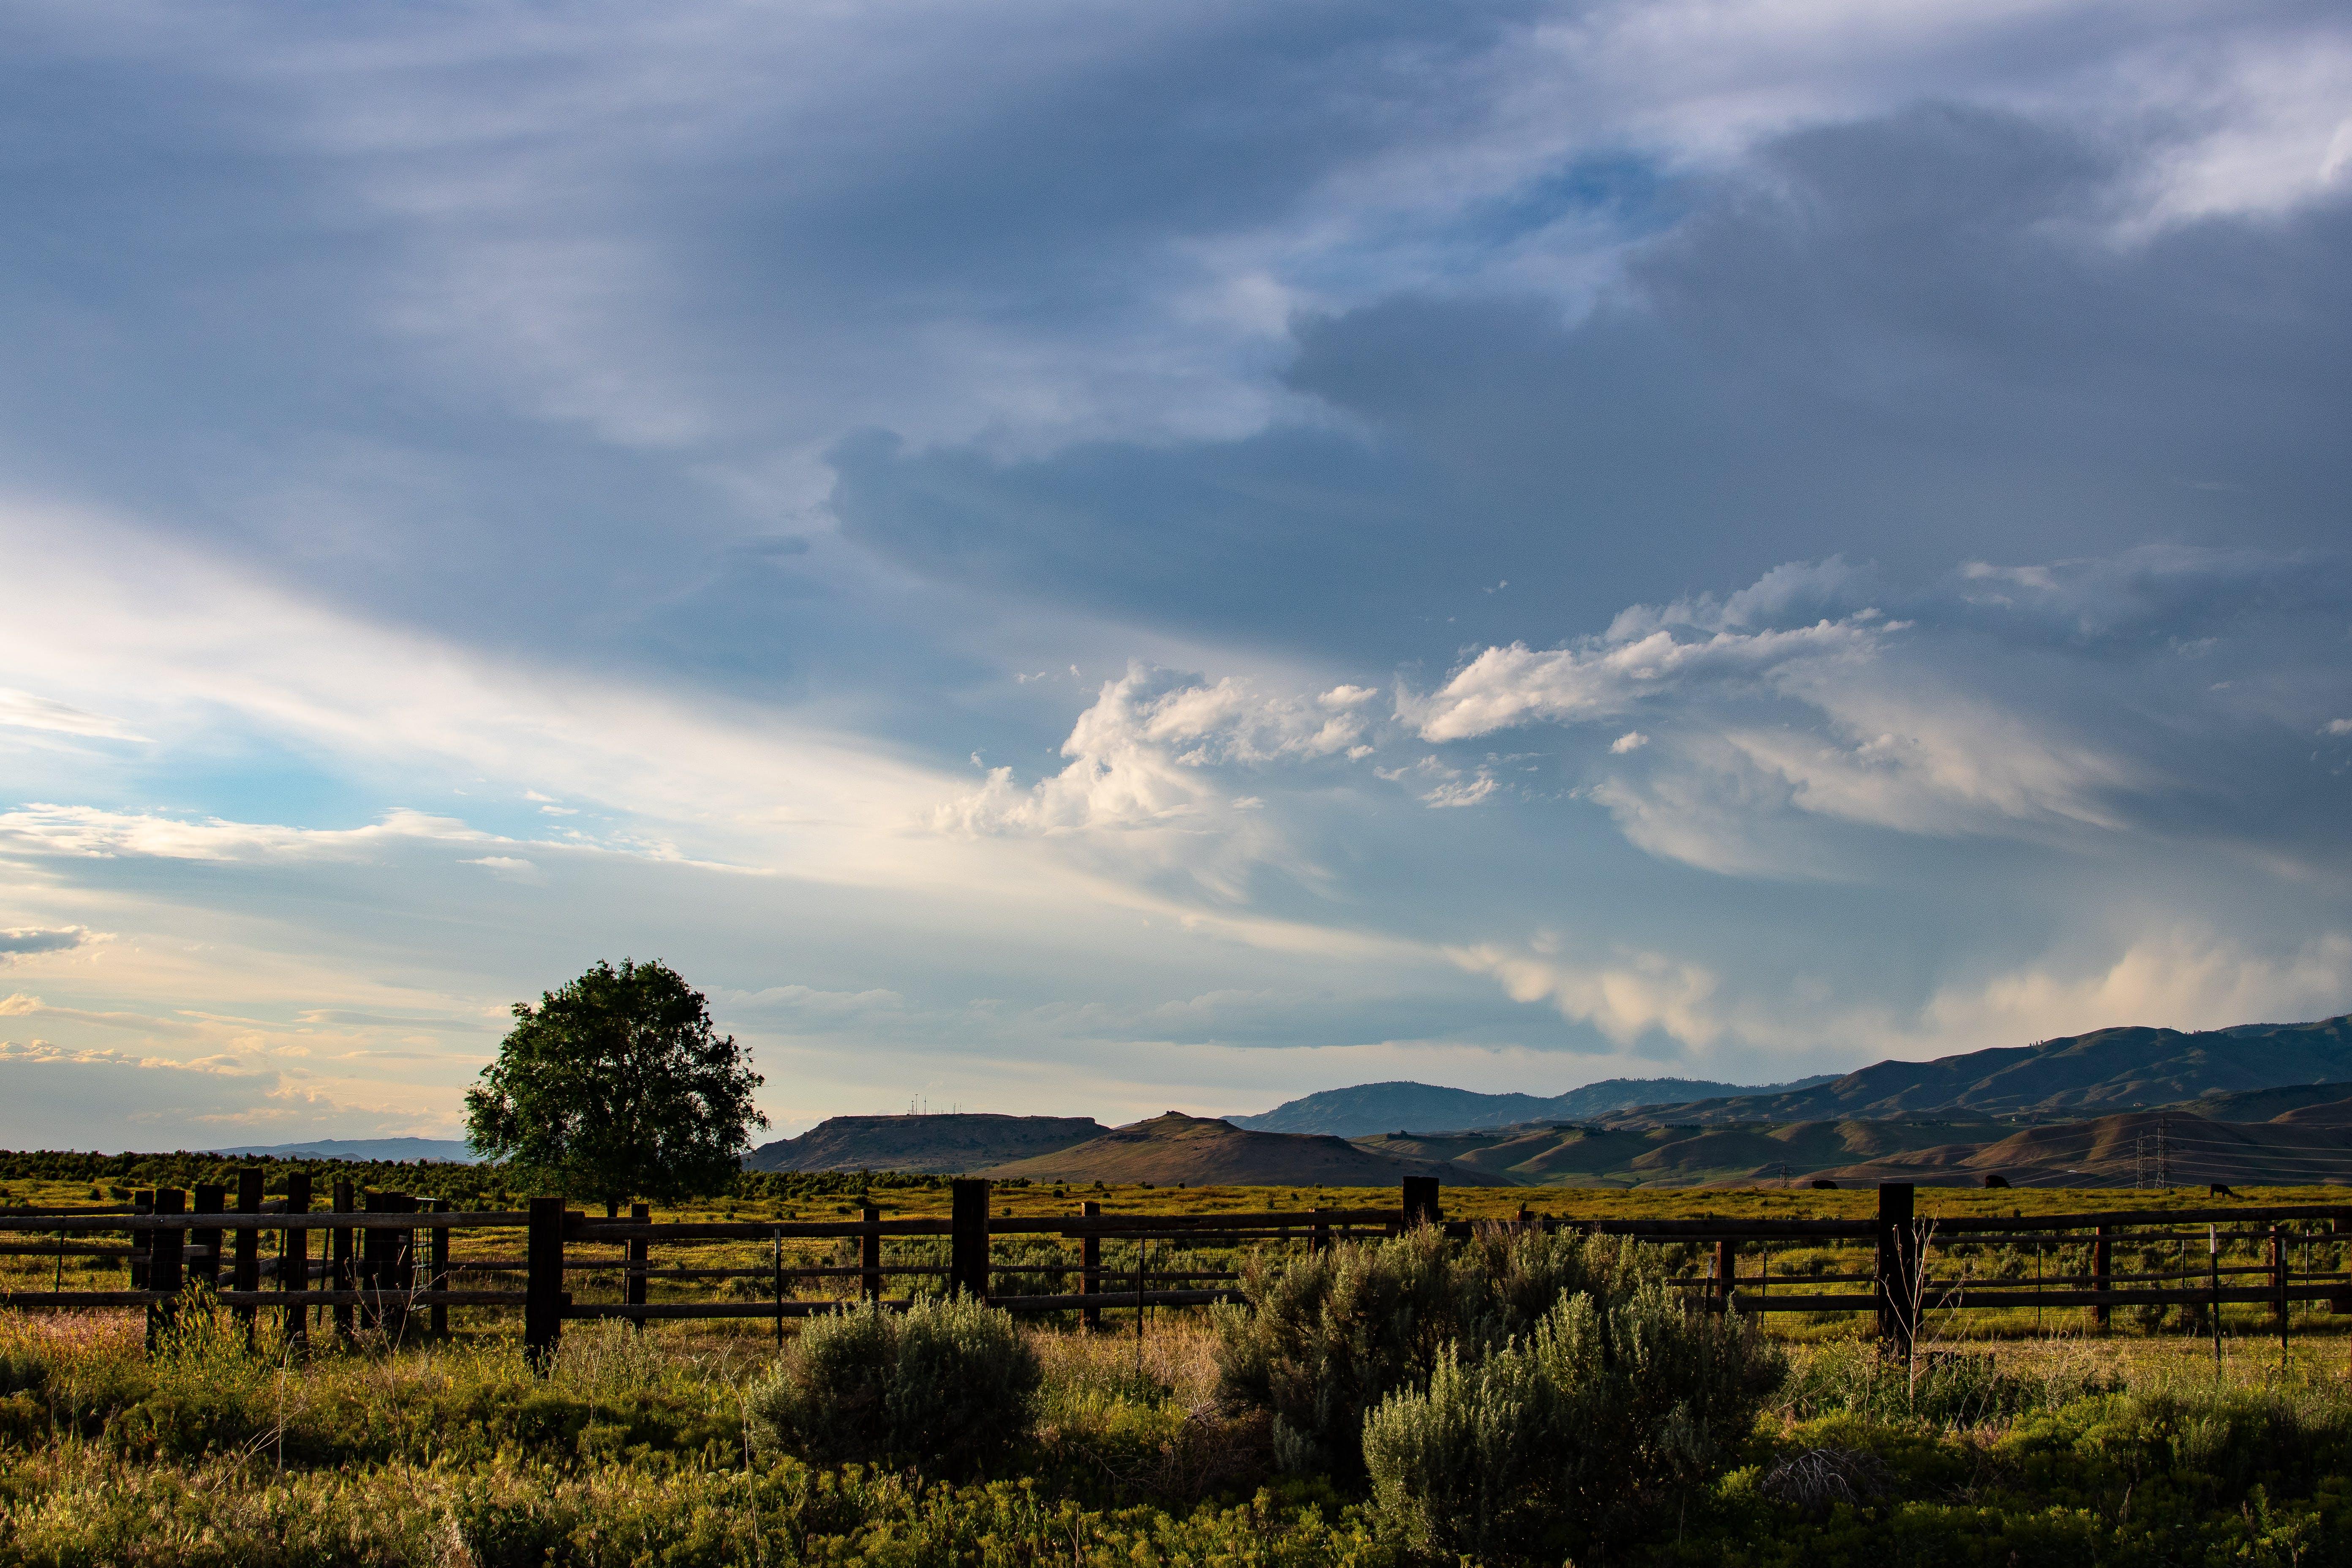 Green Field Under Gray Clouds